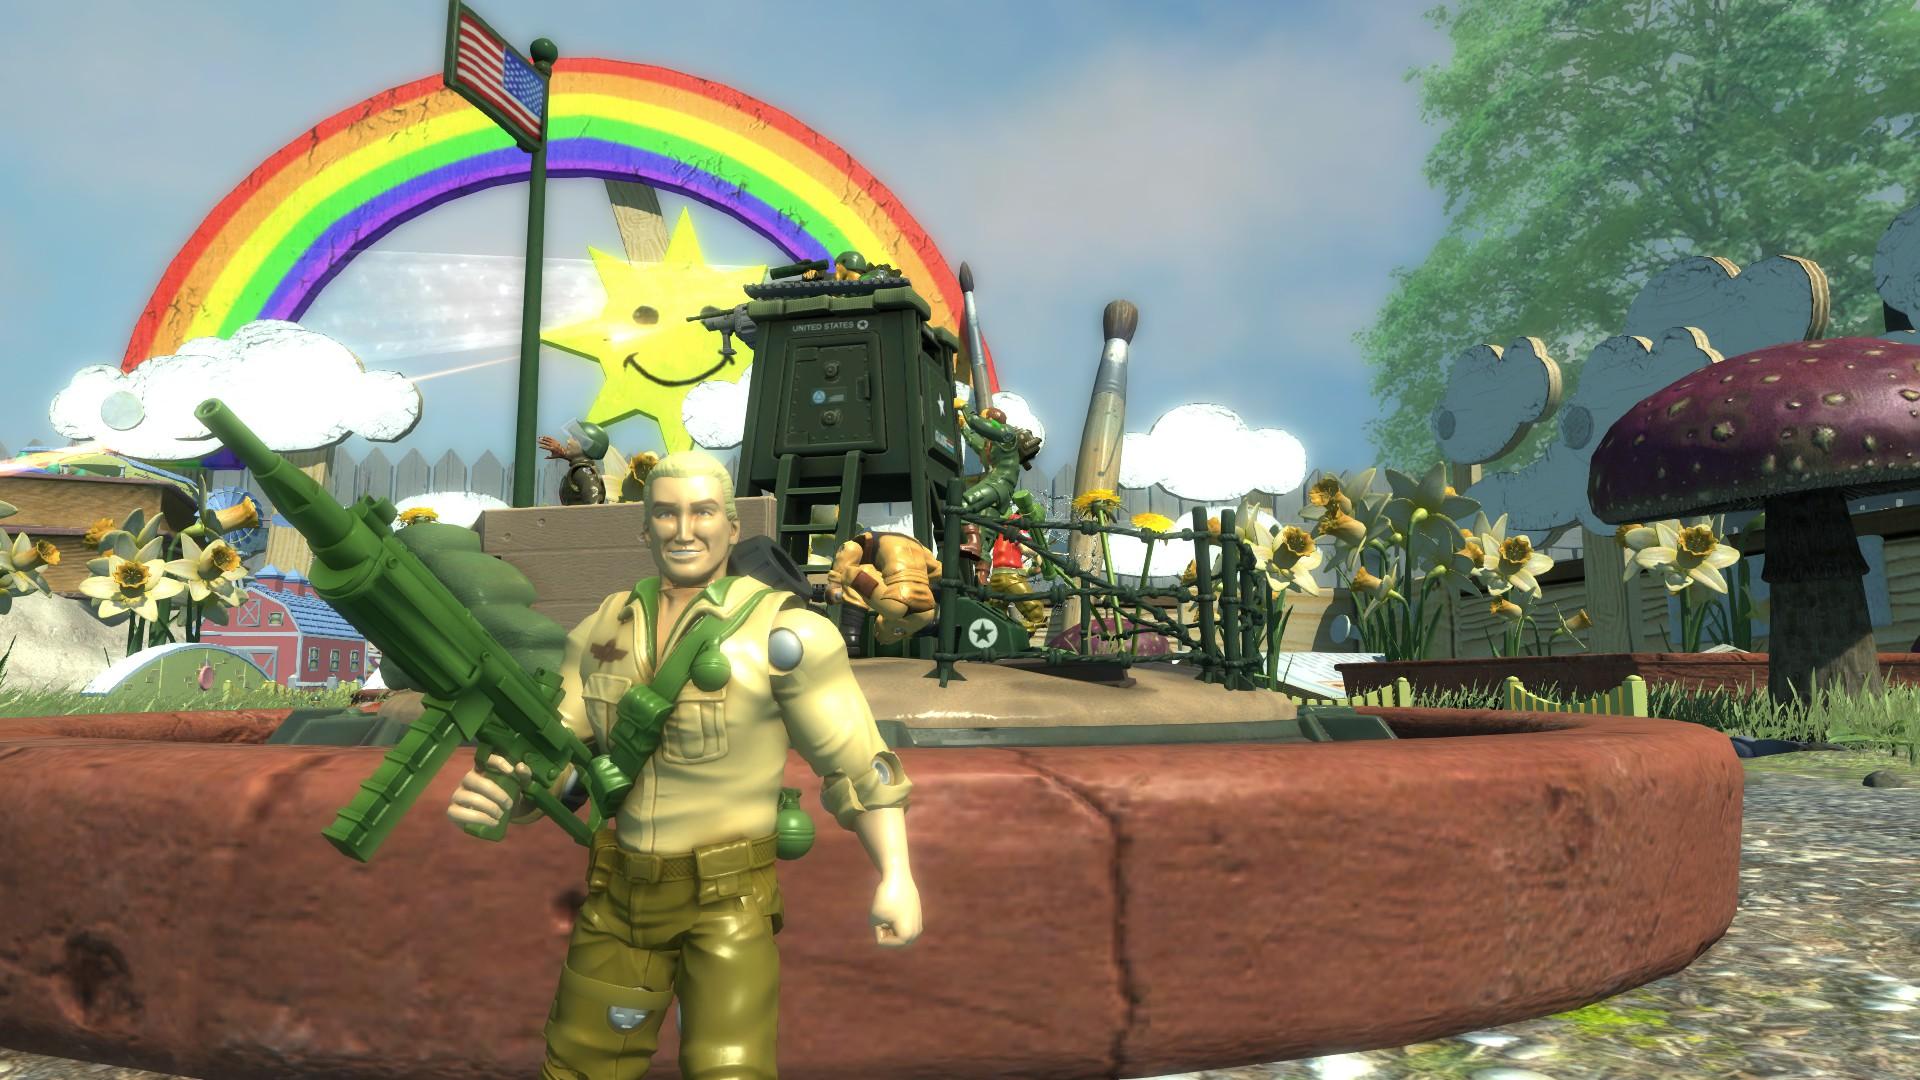 http://joebattlelines.com/wp-content/gallery/toy-soldiers-war-chest/gi_joe_tswc_002_1433870964.jpg